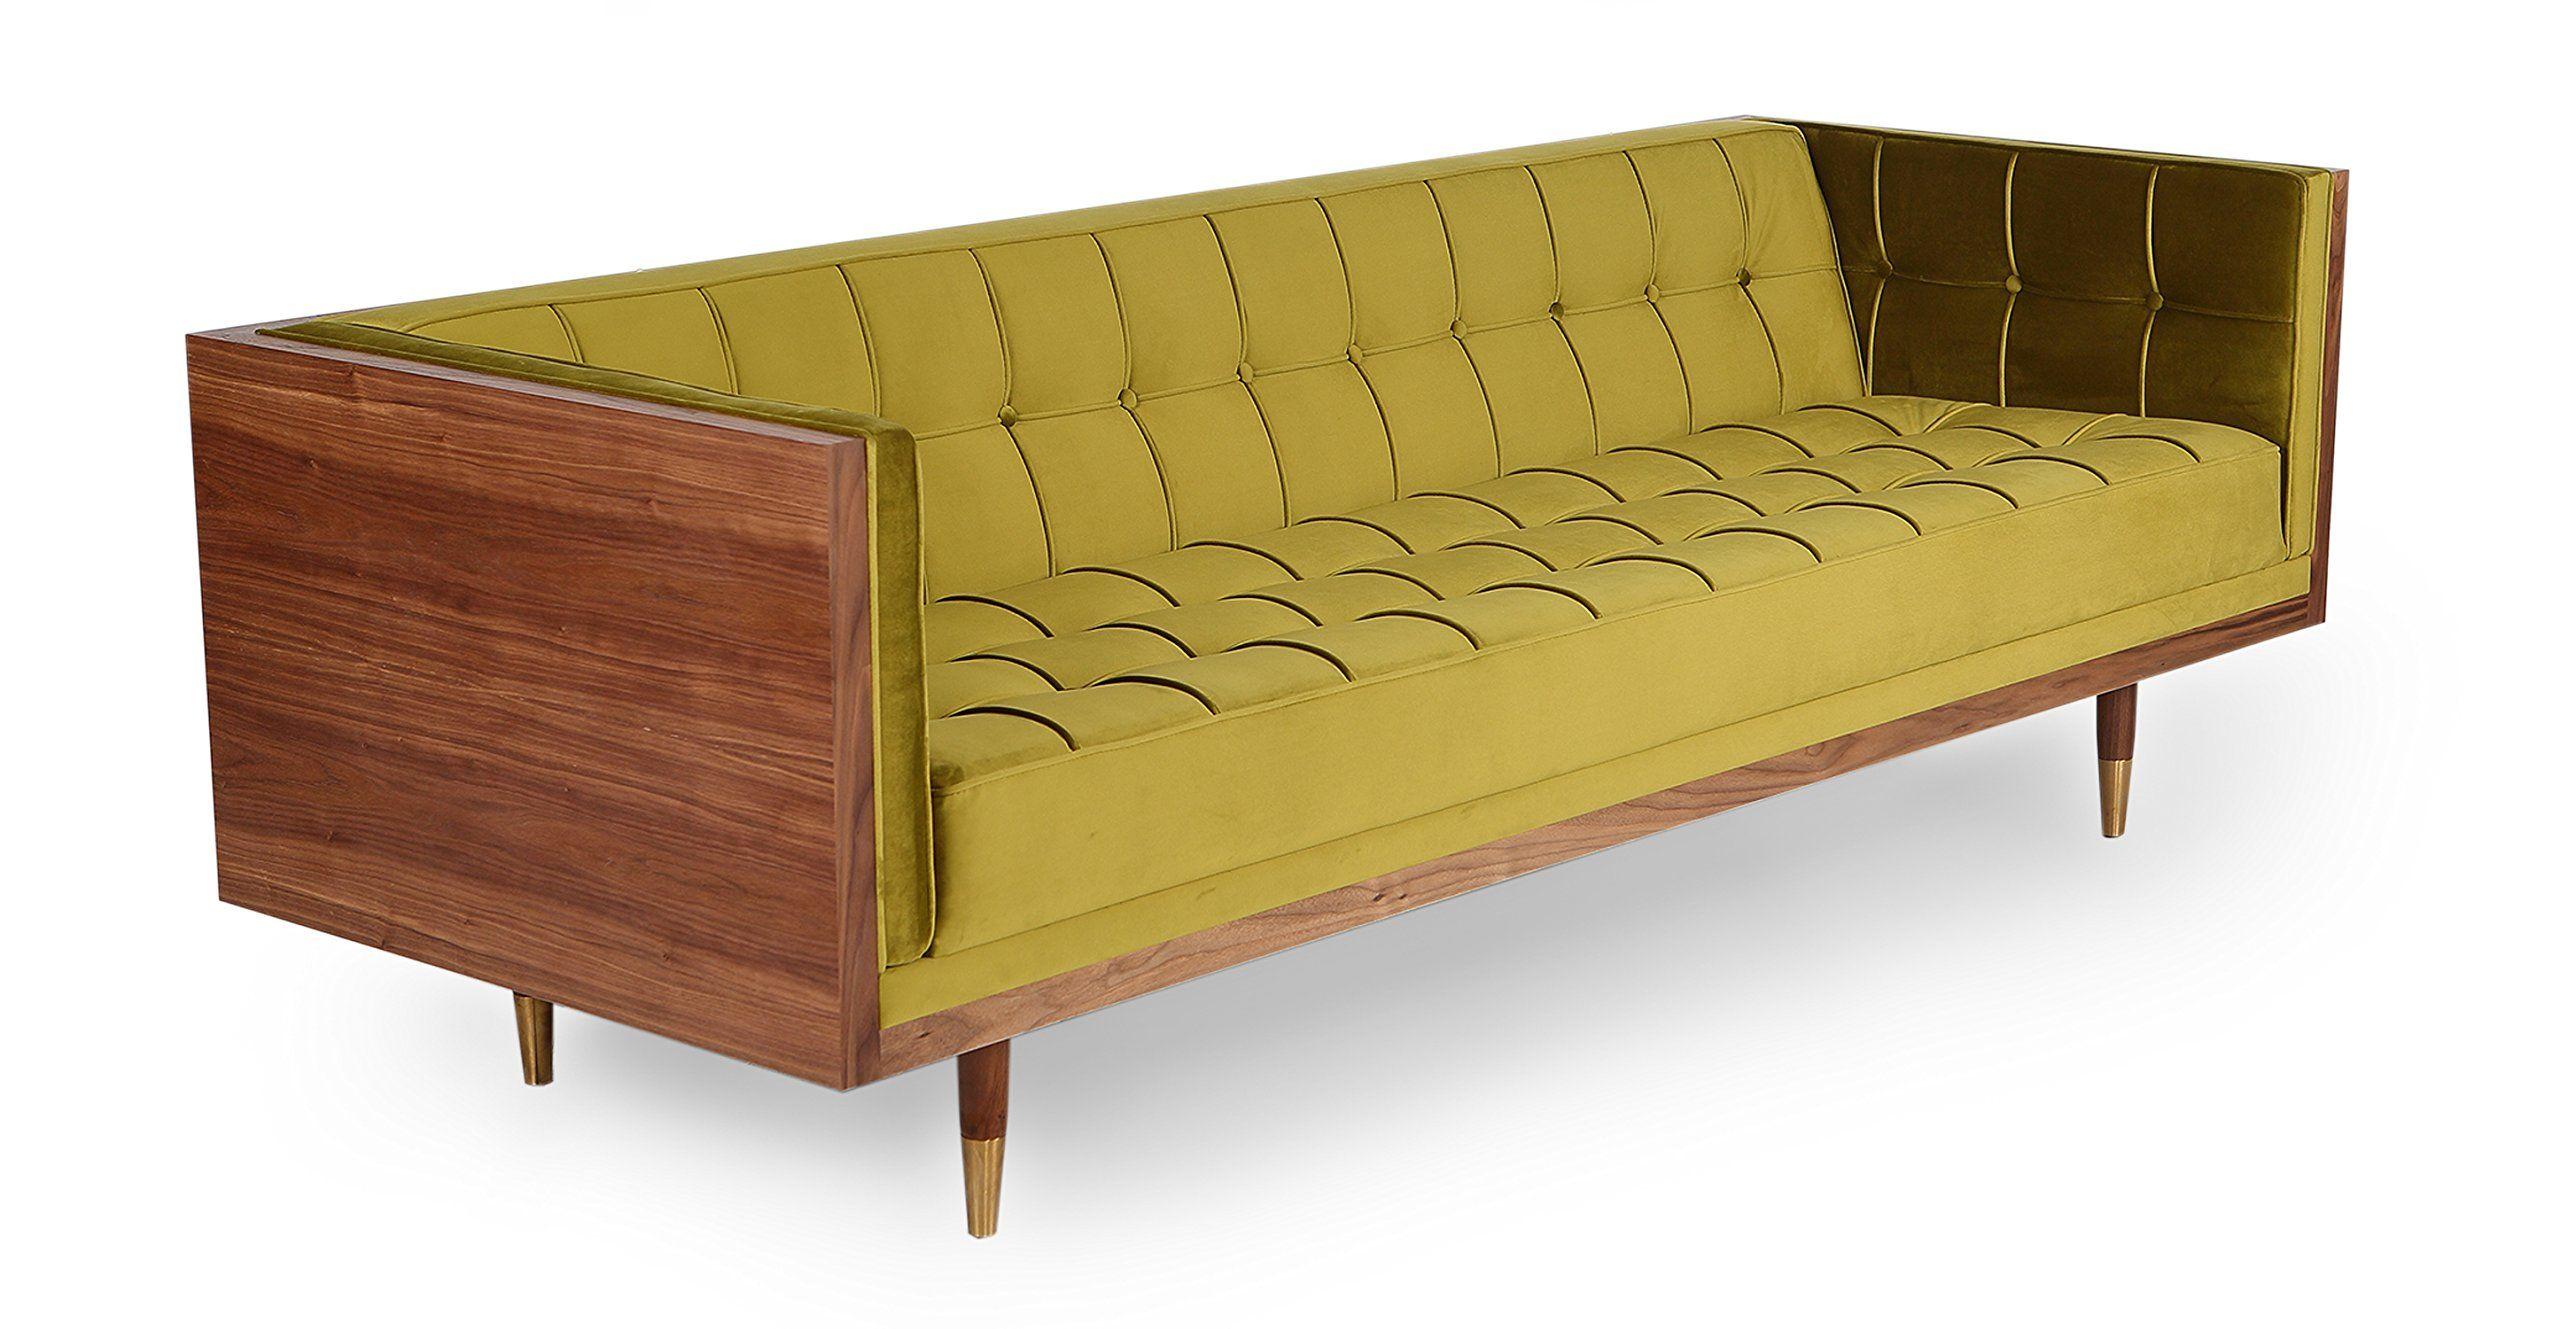 Awe Inspiring Kardiel Woodrow Midcentury Modern Box Sofa Olive Velvet Cjindustries Chair Design For Home Cjindustriesco